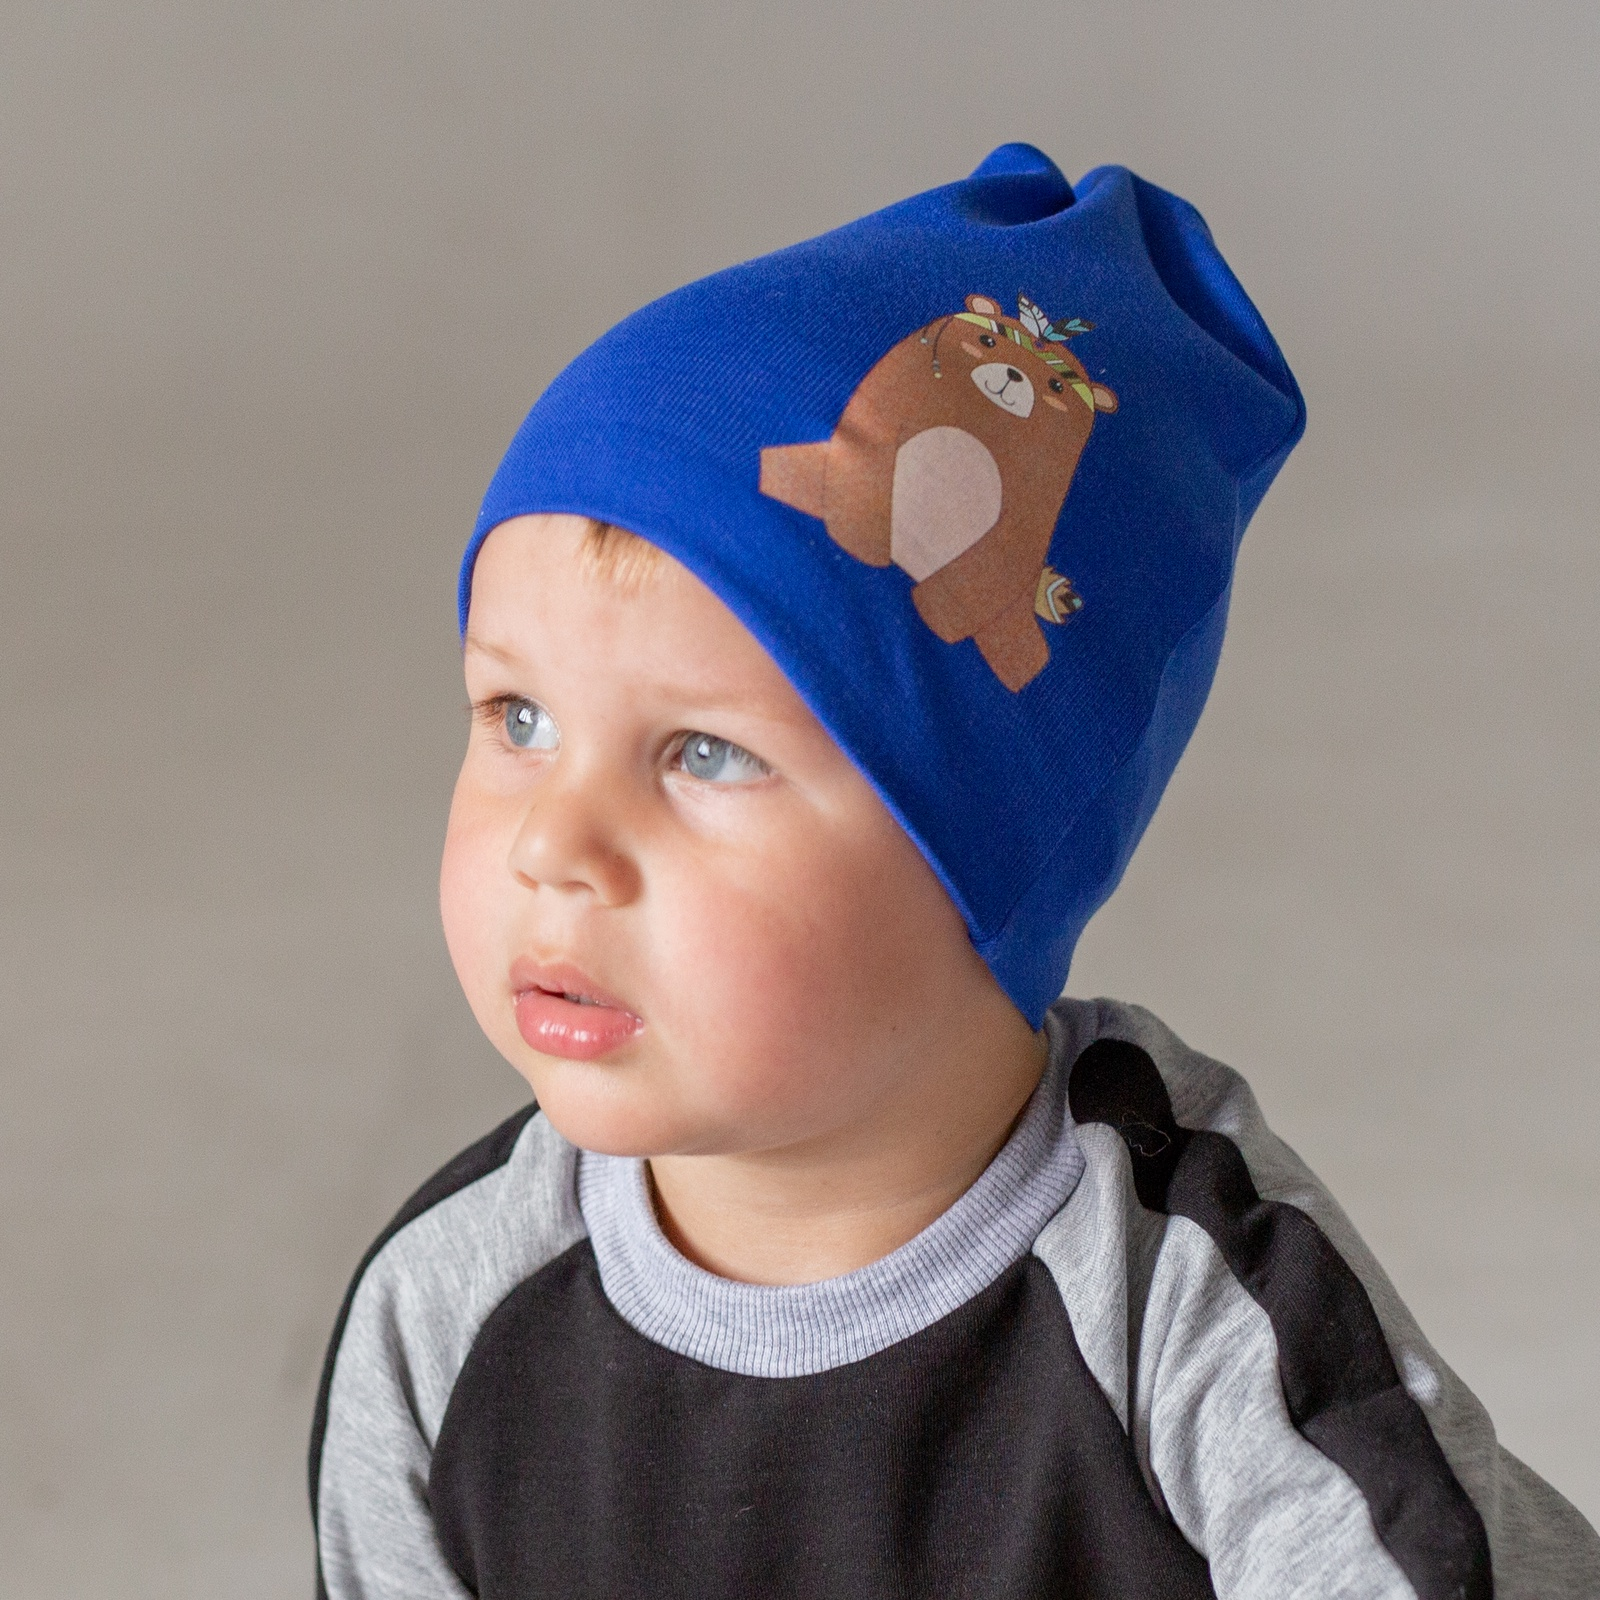 Шапка HOHLOON ШО18-194син 50-54 синий , 50 размерШО18-194син 50-54Шапка двухслойная с аппликацией Мишка-Индеец,цвет синий